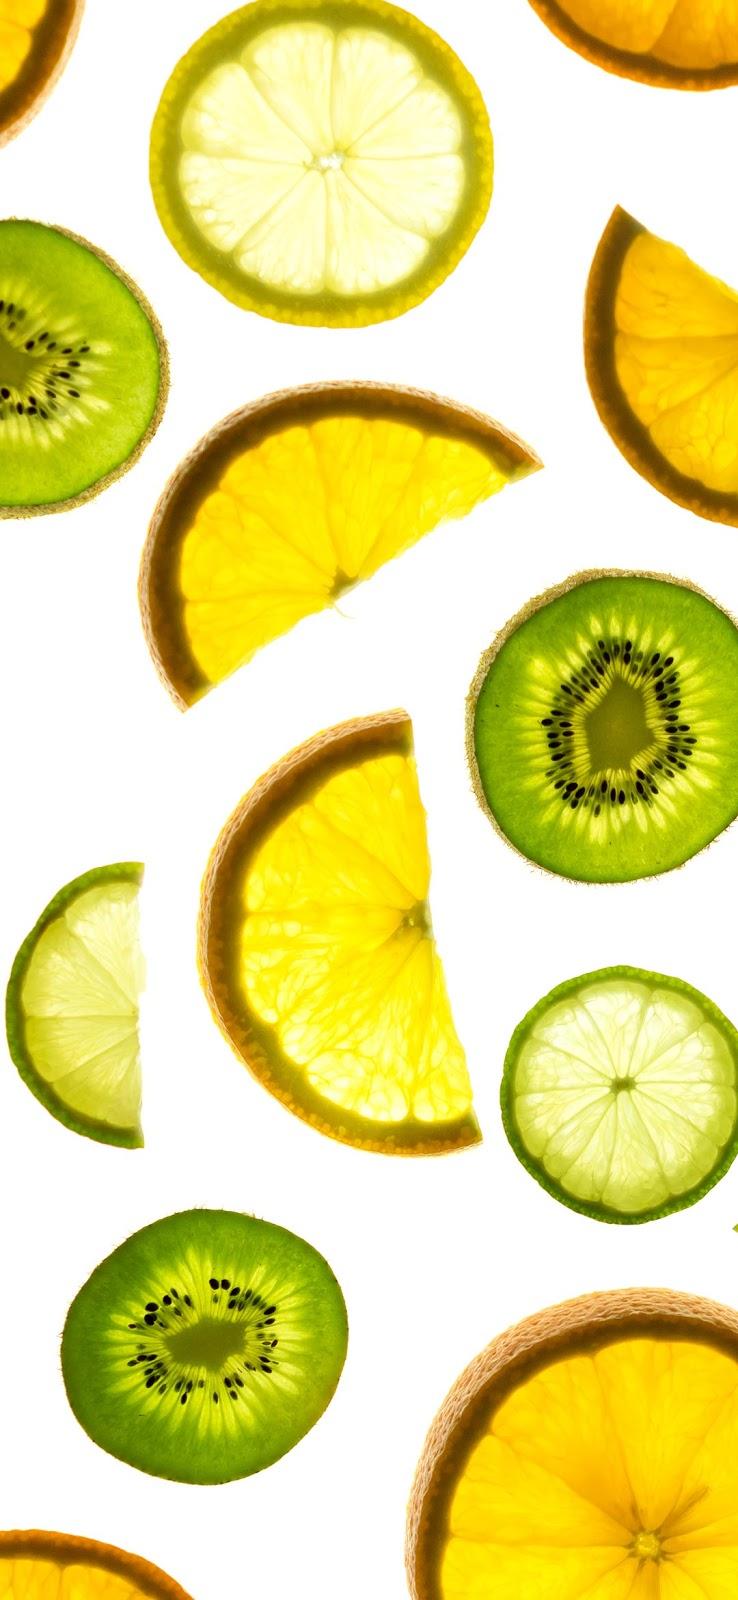 orange lemon kiwi fruits wallpaper